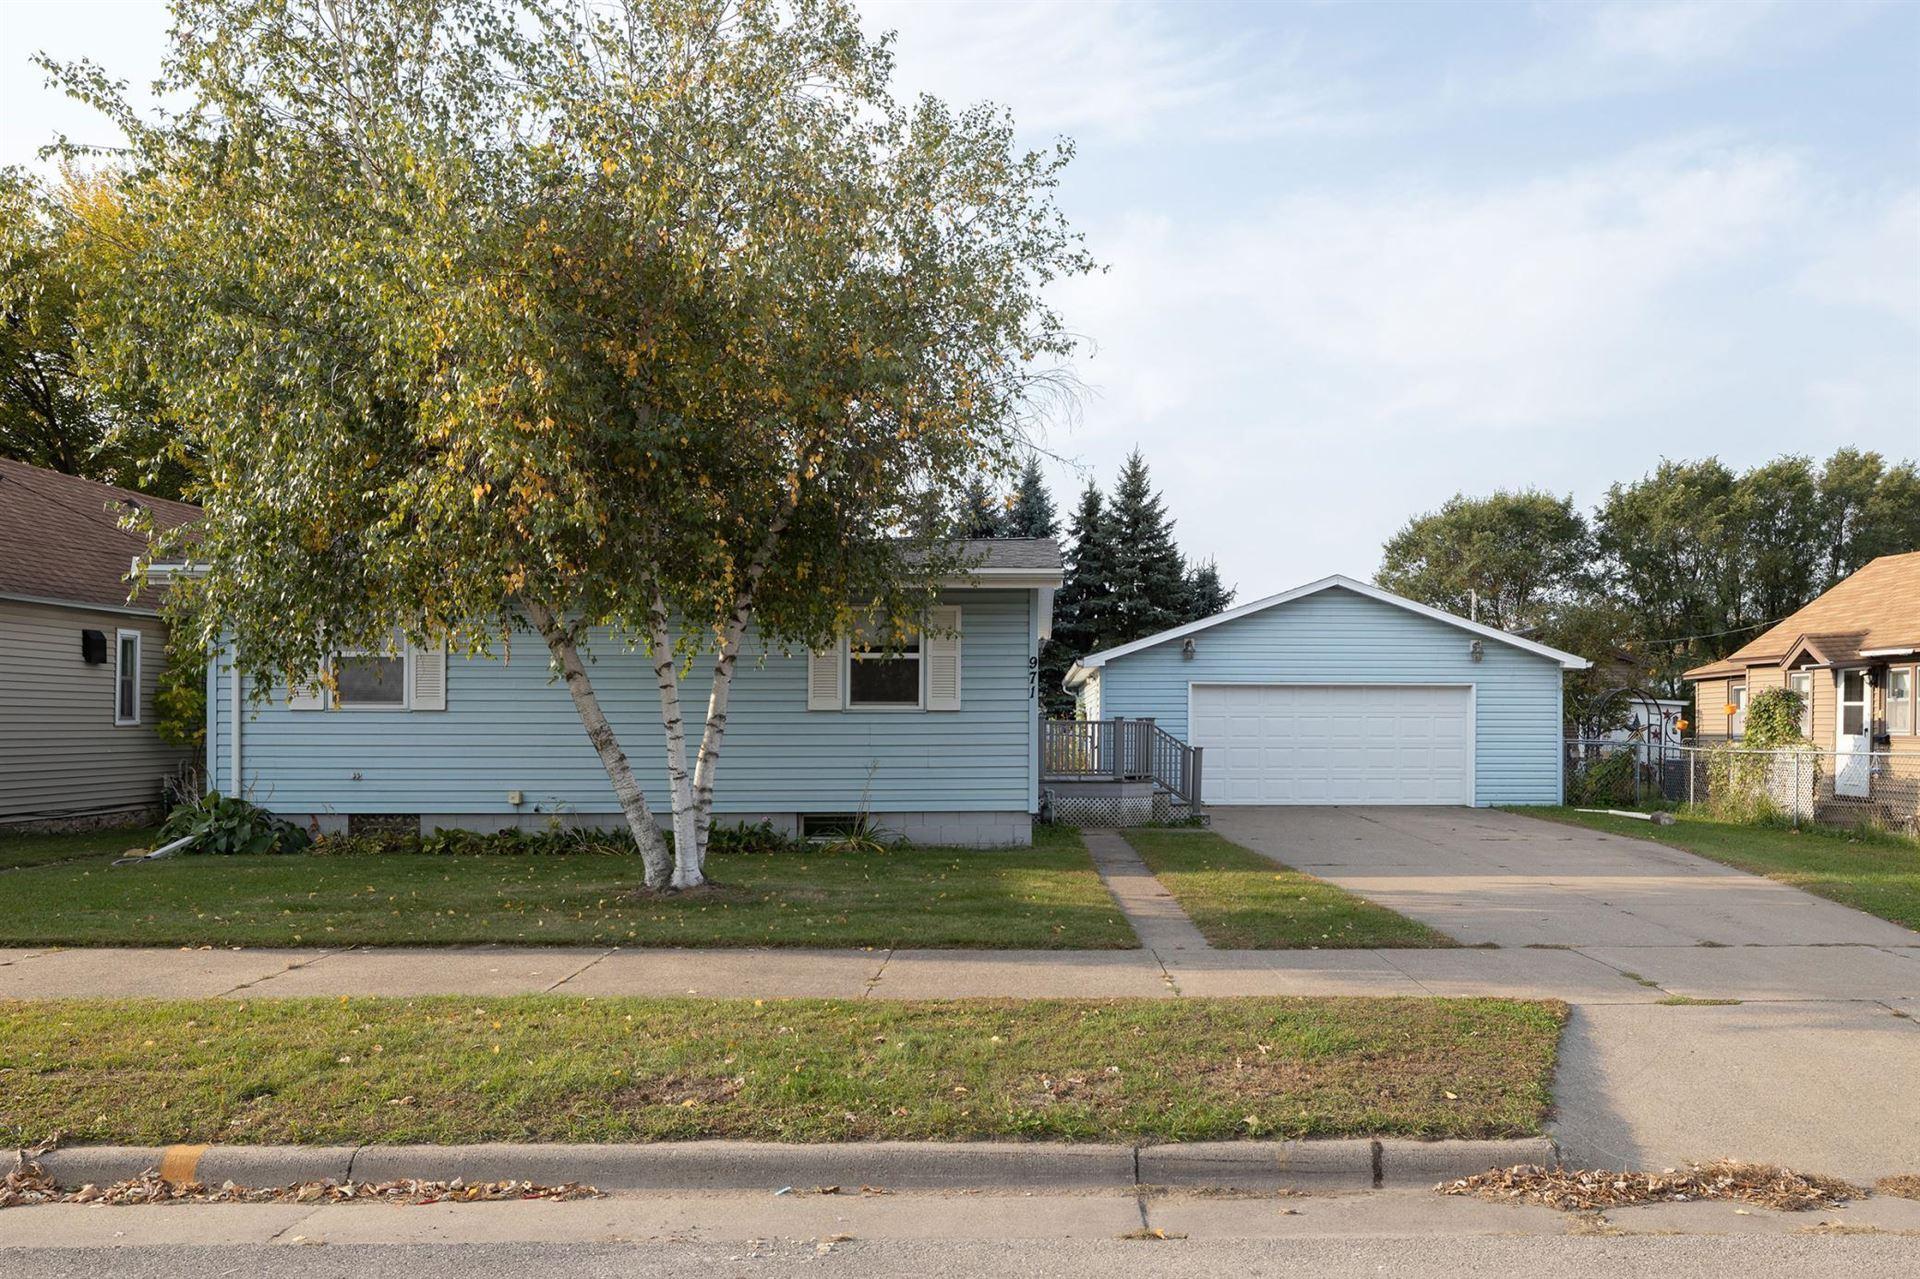 971 E King Street, Winona, MN 55987 - MLS#: 5672346